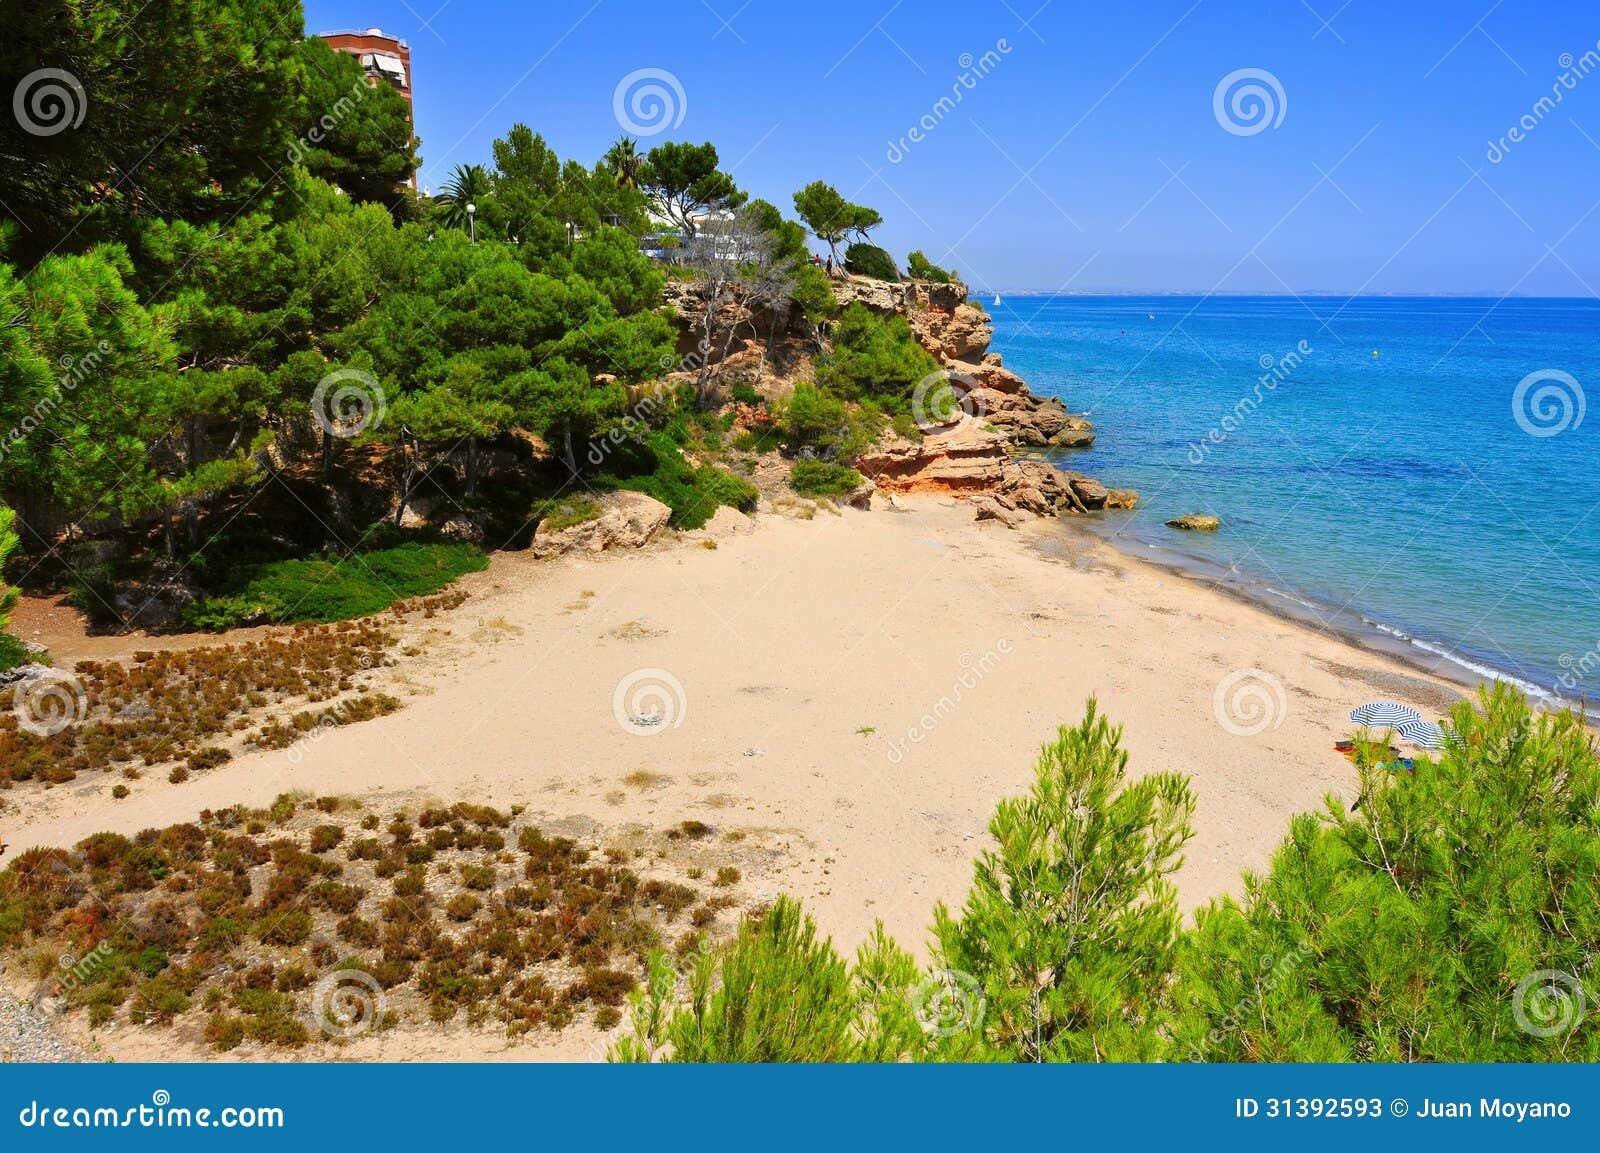 cala dels vienesos beach in miami platja spain stock. Black Bedroom Furniture Sets. Home Design Ideas